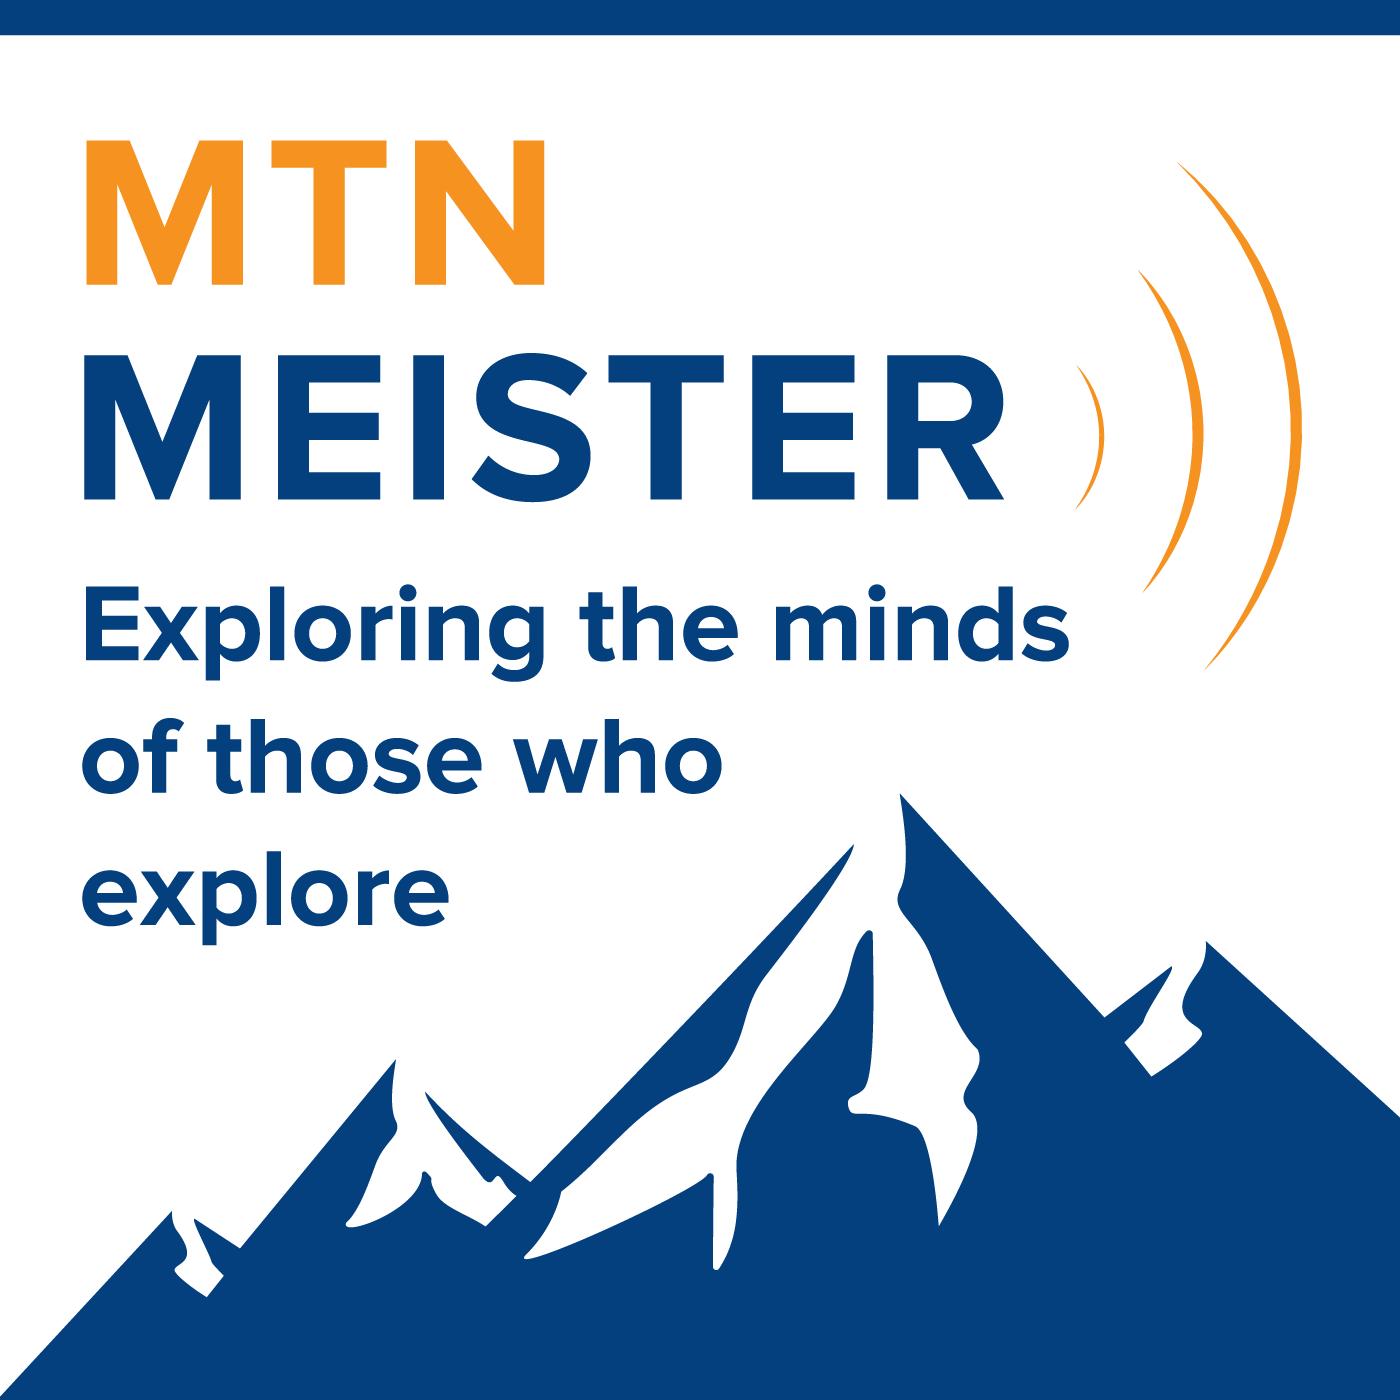 MtnMeister